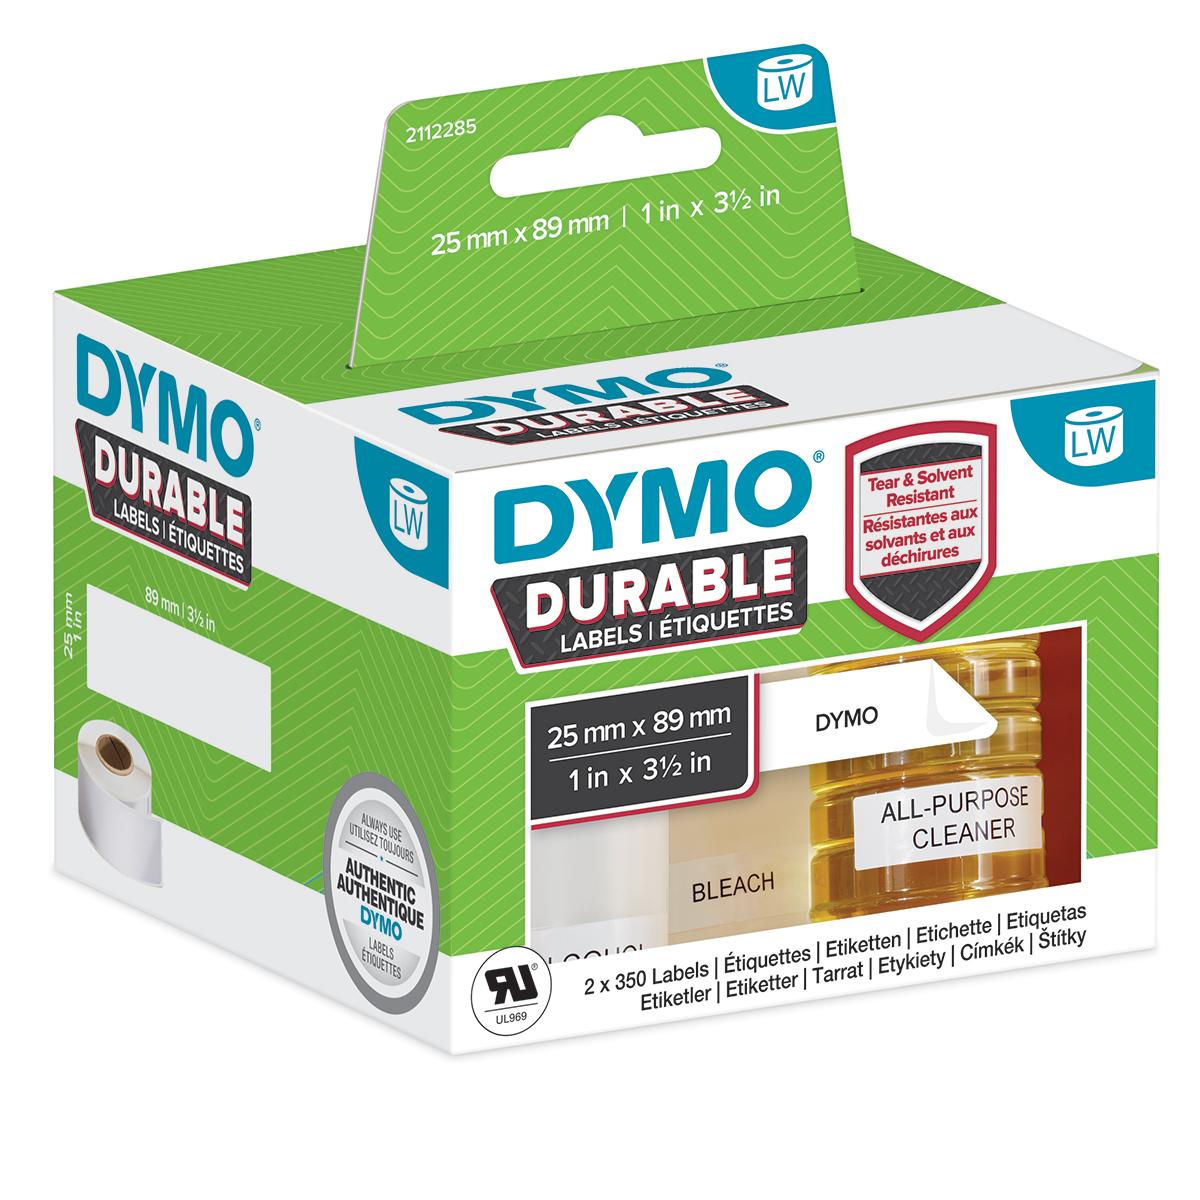 Dymo 2112285 LW Durable shelving label 25mm x 89mm Black on White